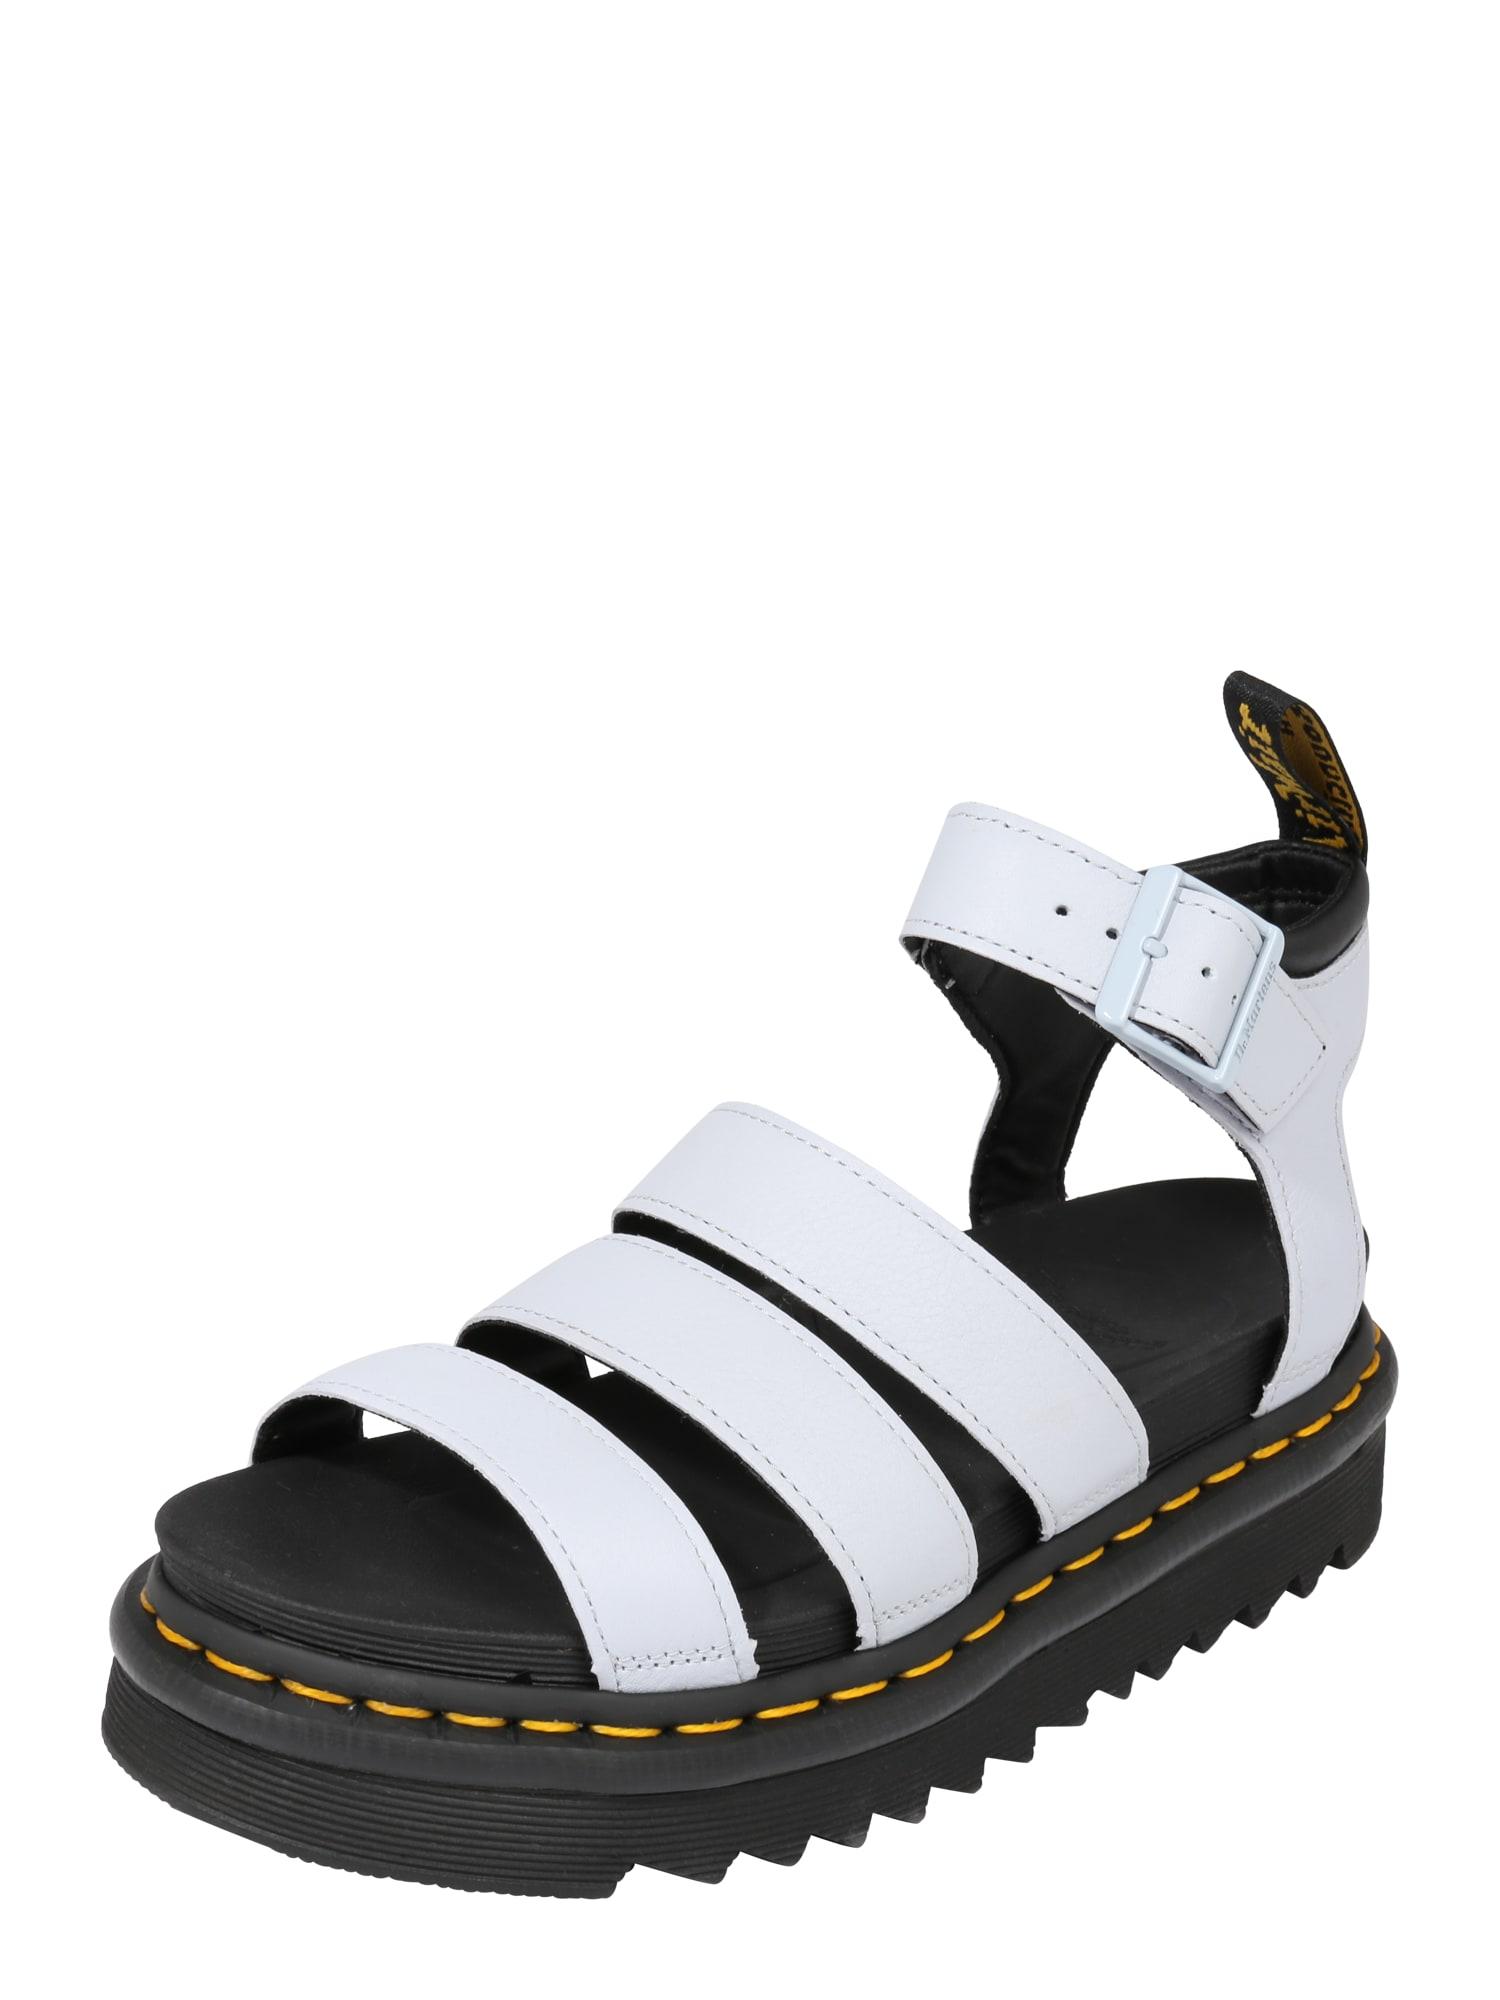 Páskové sandály Chunky Blaire světlemodrá offwhite Dr. Martens